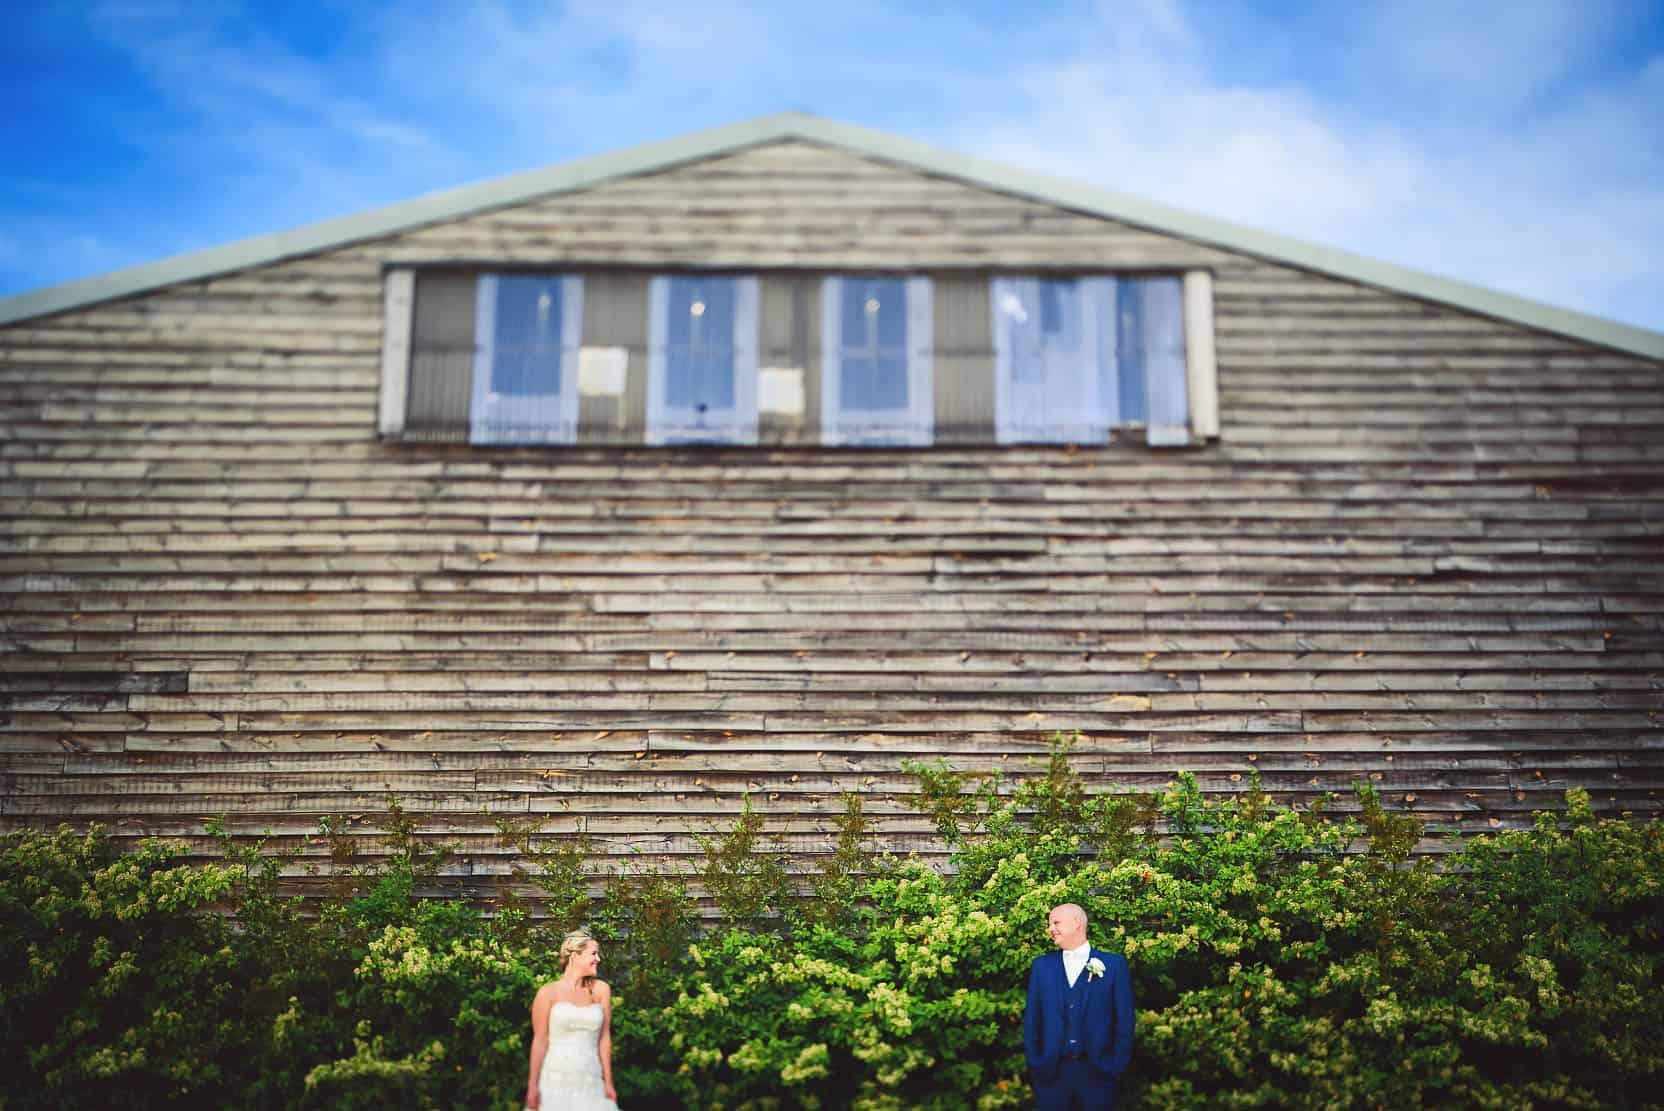 033_Maidens_Barn_Wedding_Essex_NJ_Justin_Bailey_Photography